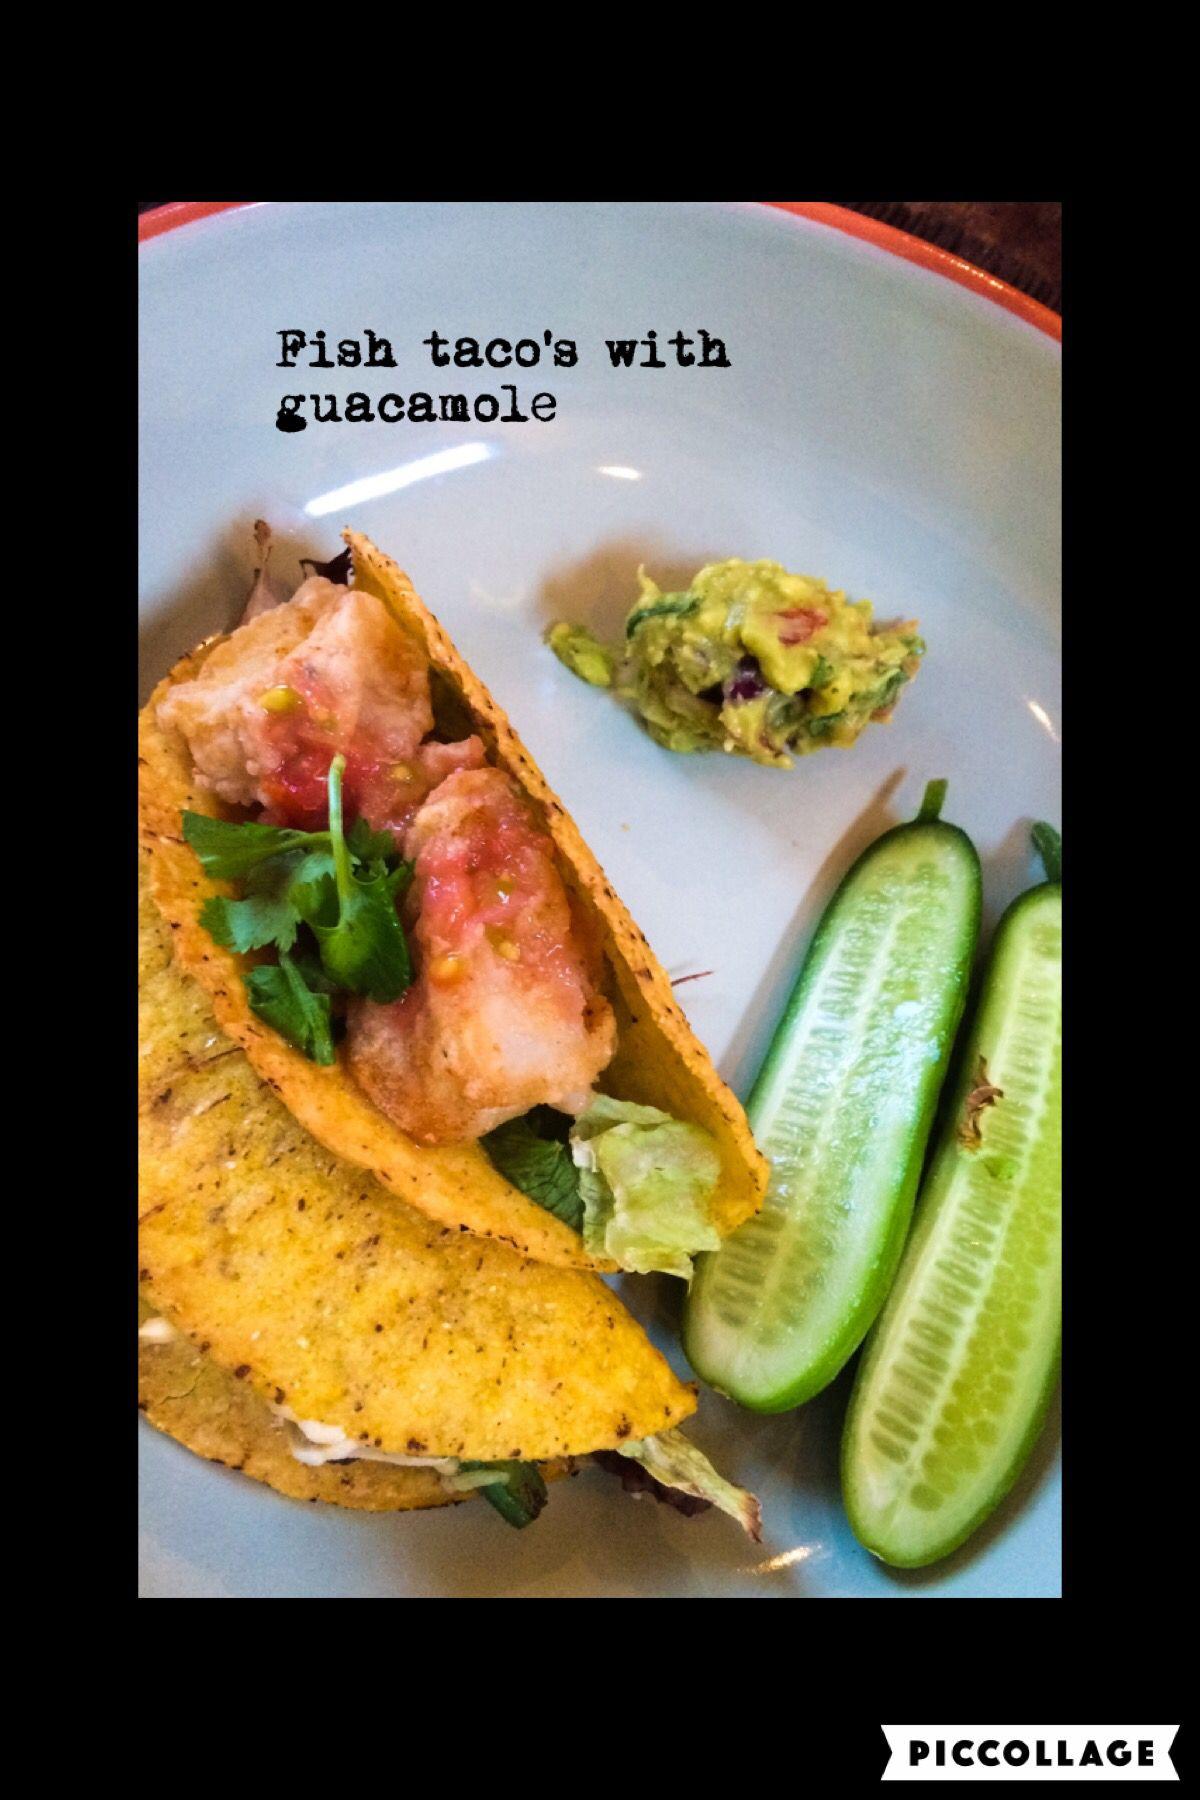 Fish taco's with guacamole and tomato salsa